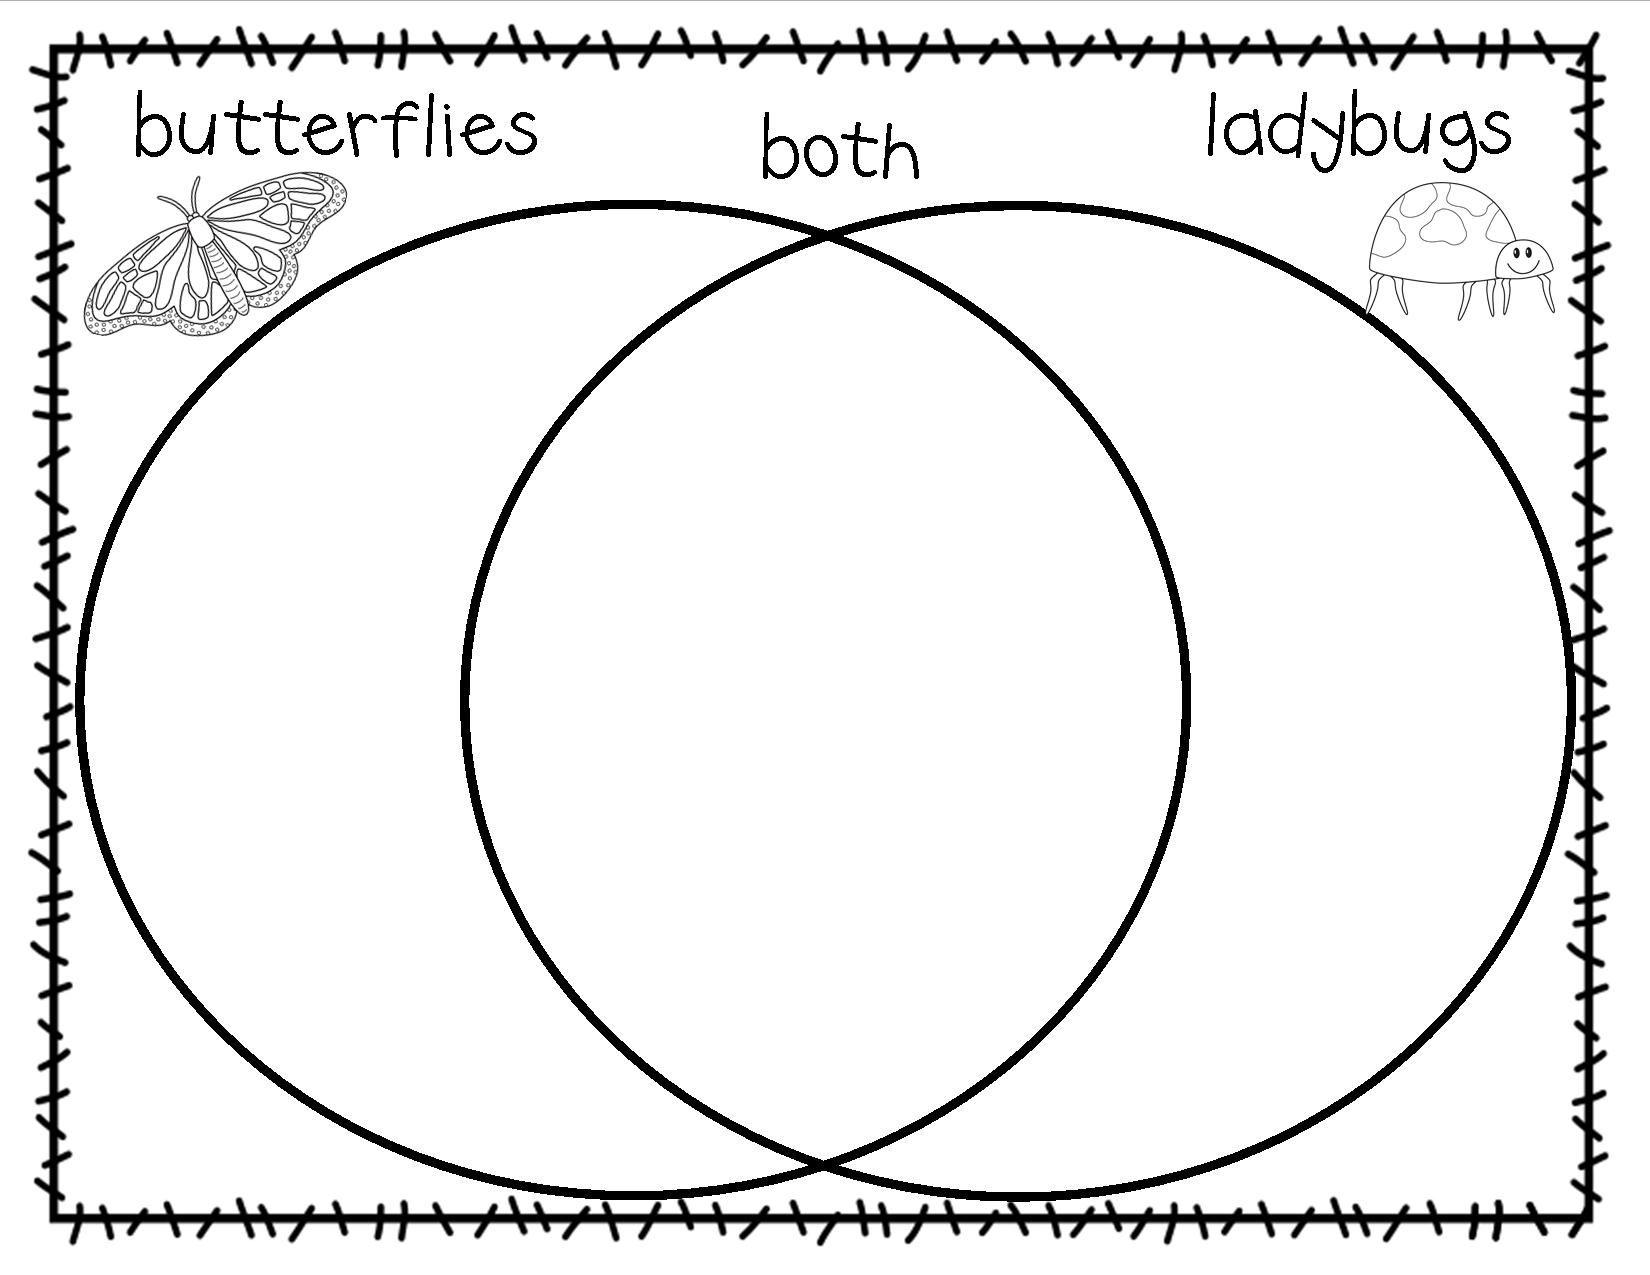 Displaying Butterfly Ladybug Venn